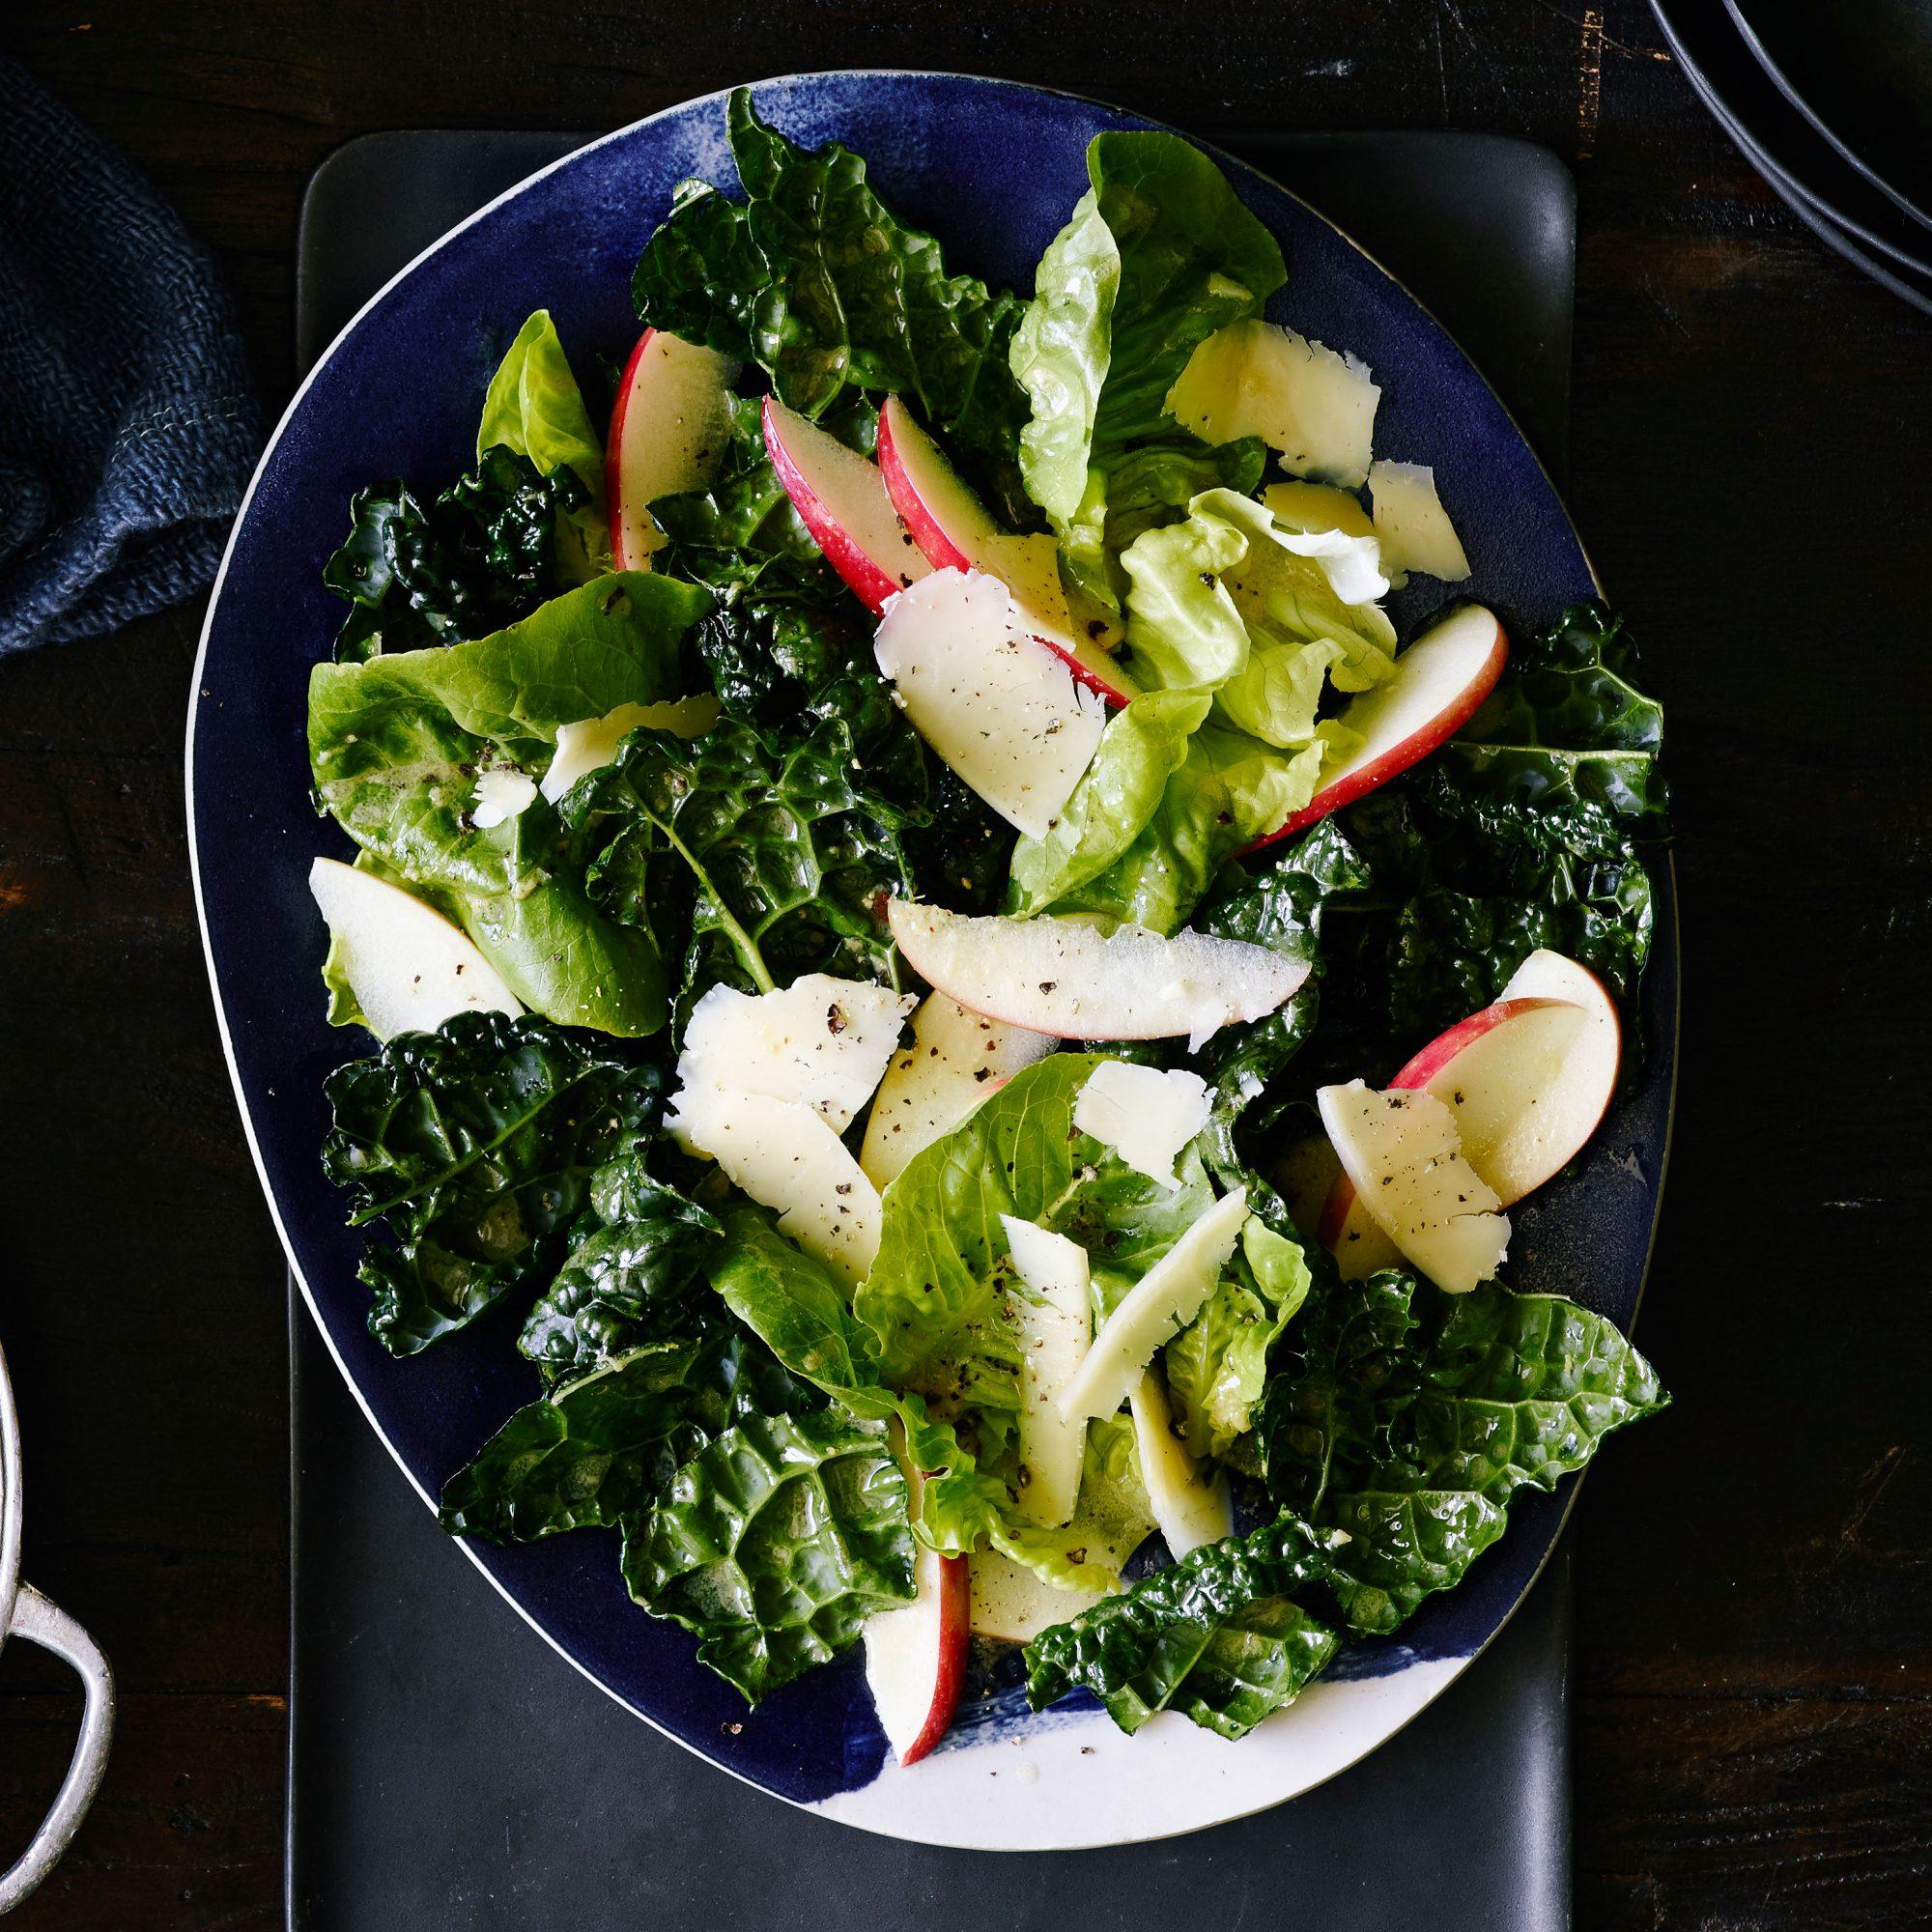 Fall Greens and Apple Salad